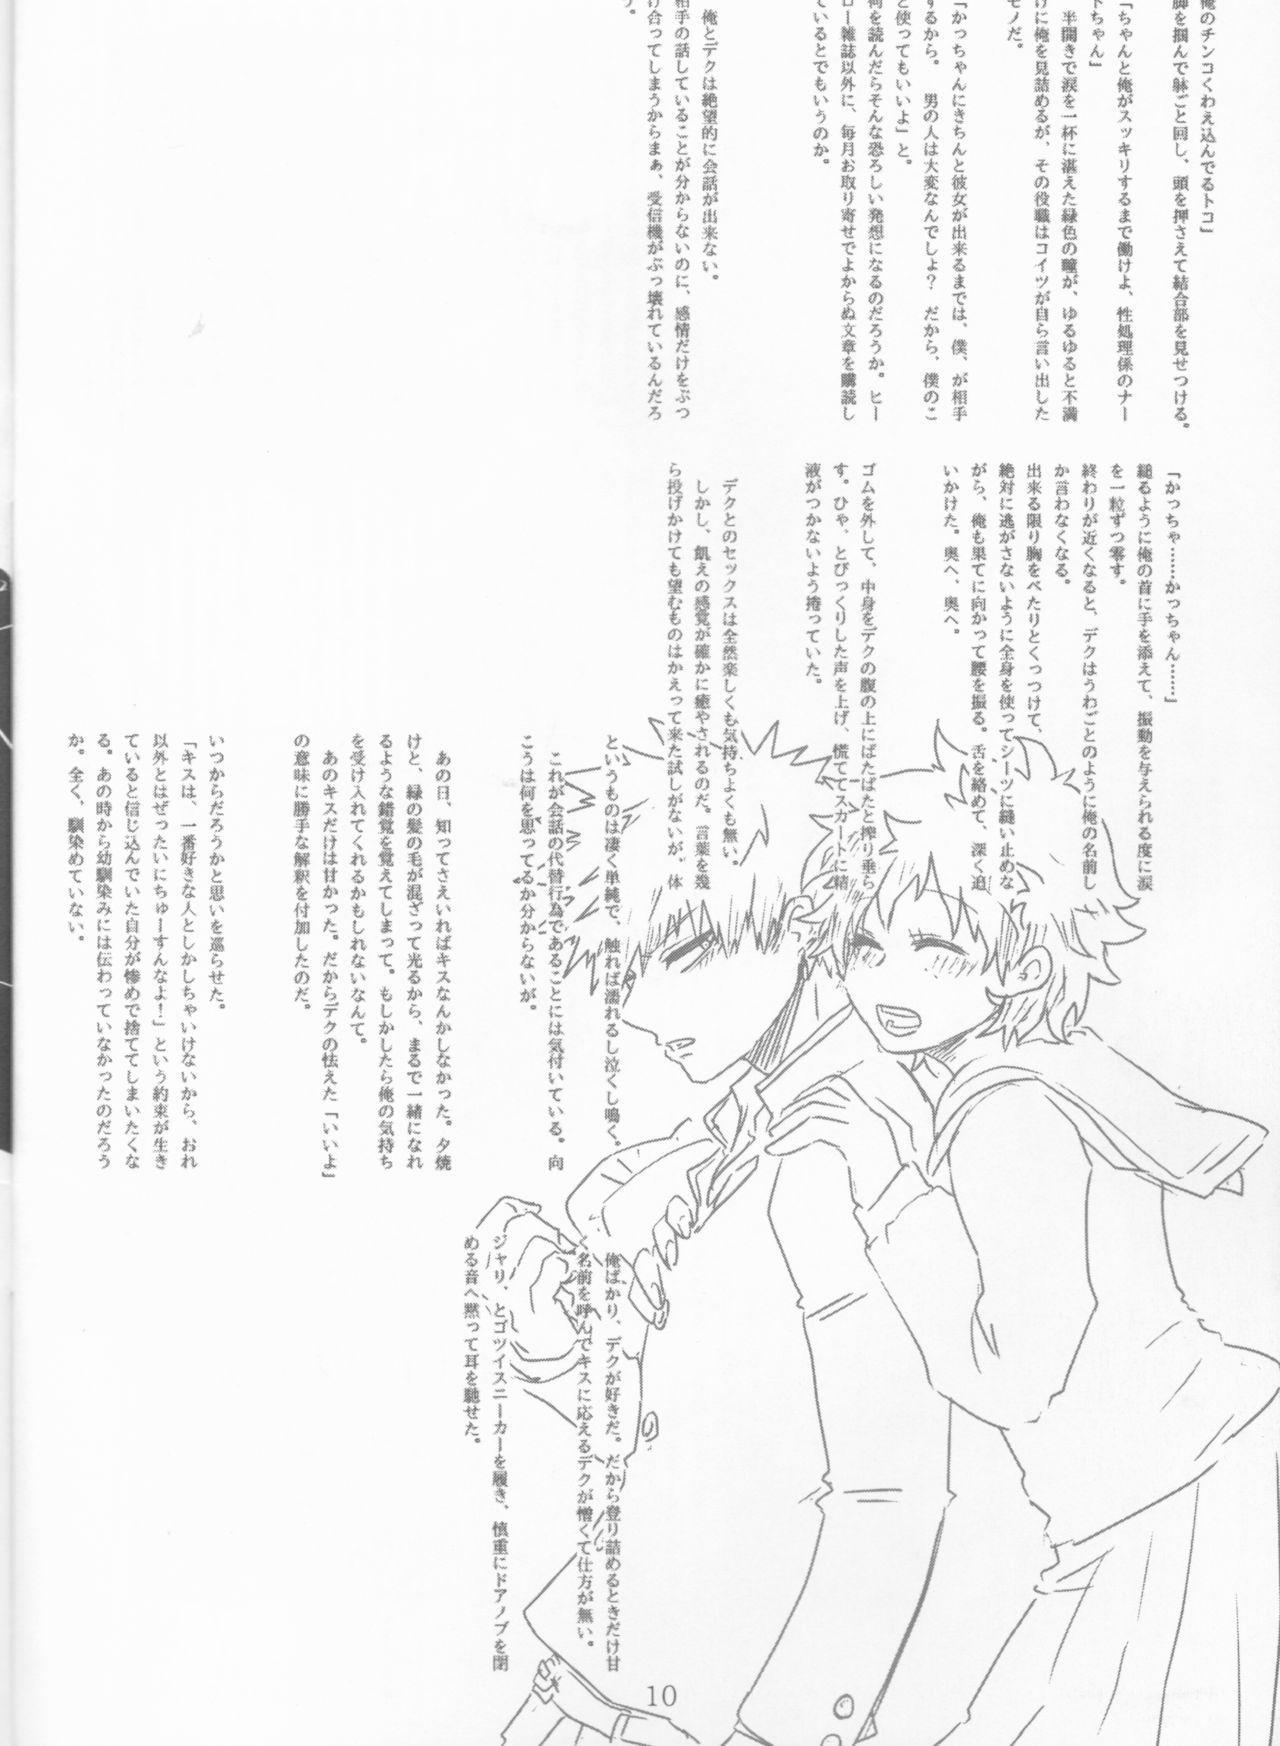 Kayowanu Futari no Kansoukyoku 9